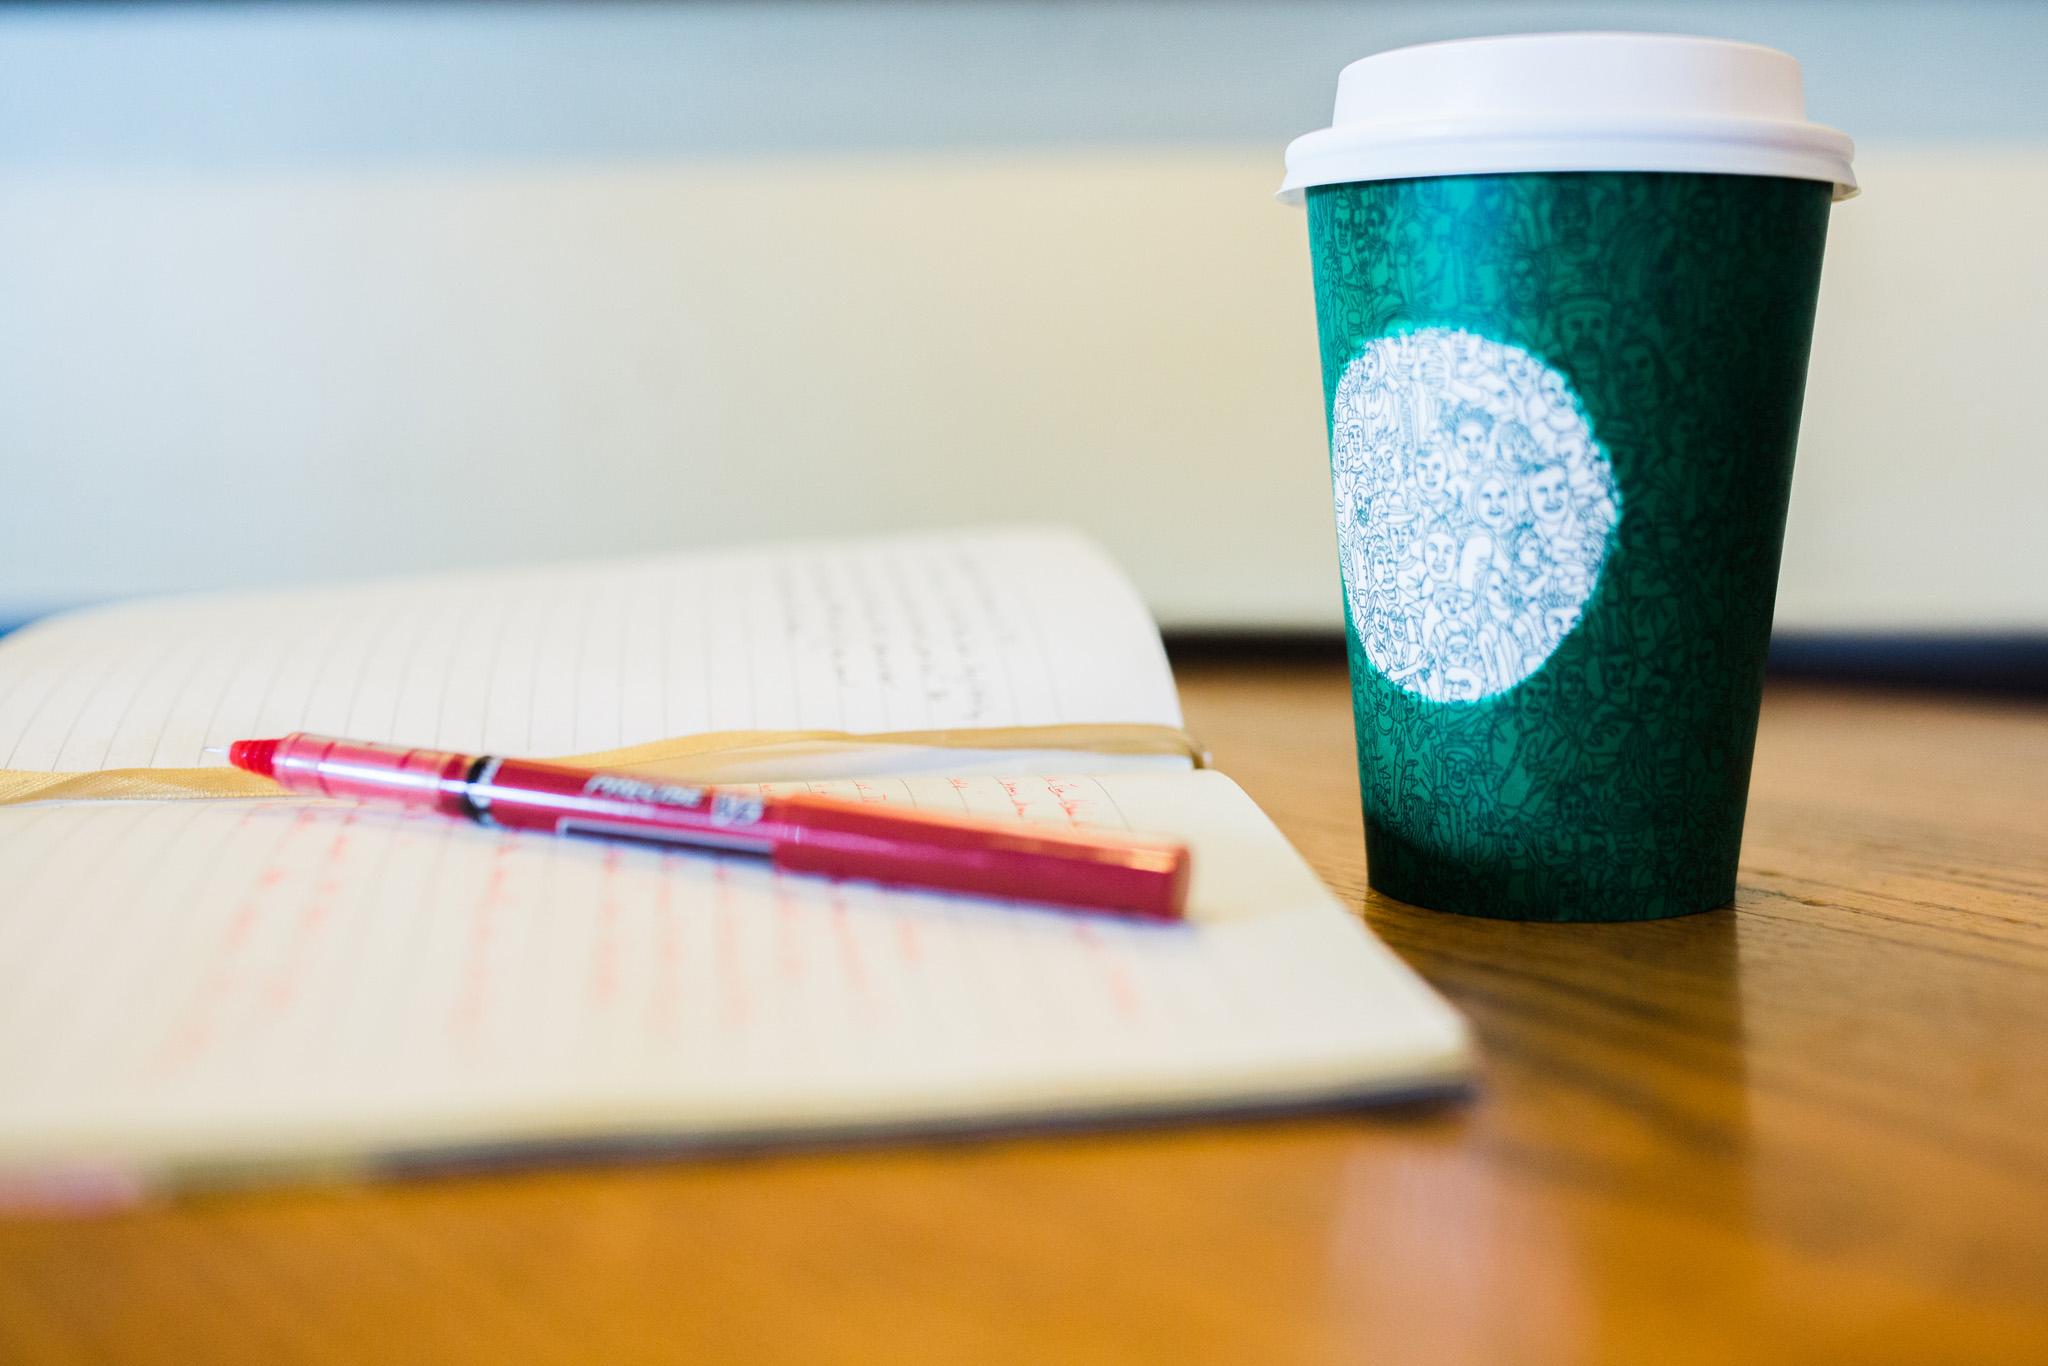 November 2: Coffee + Journal.